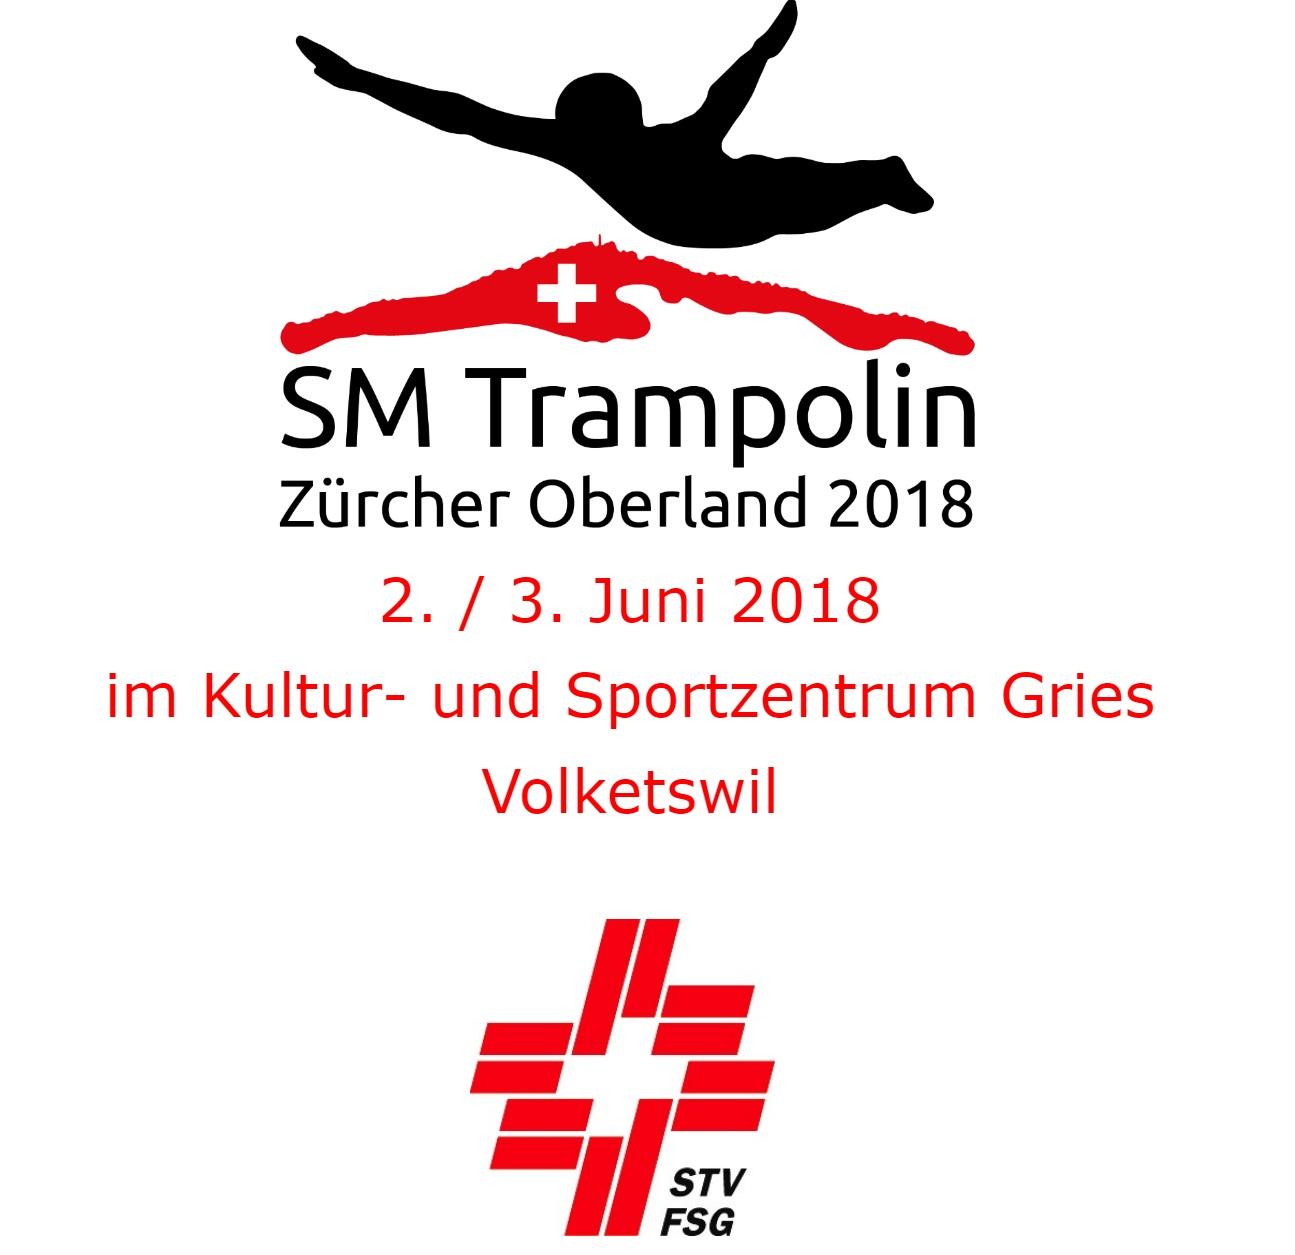 SM Trampolin Logo